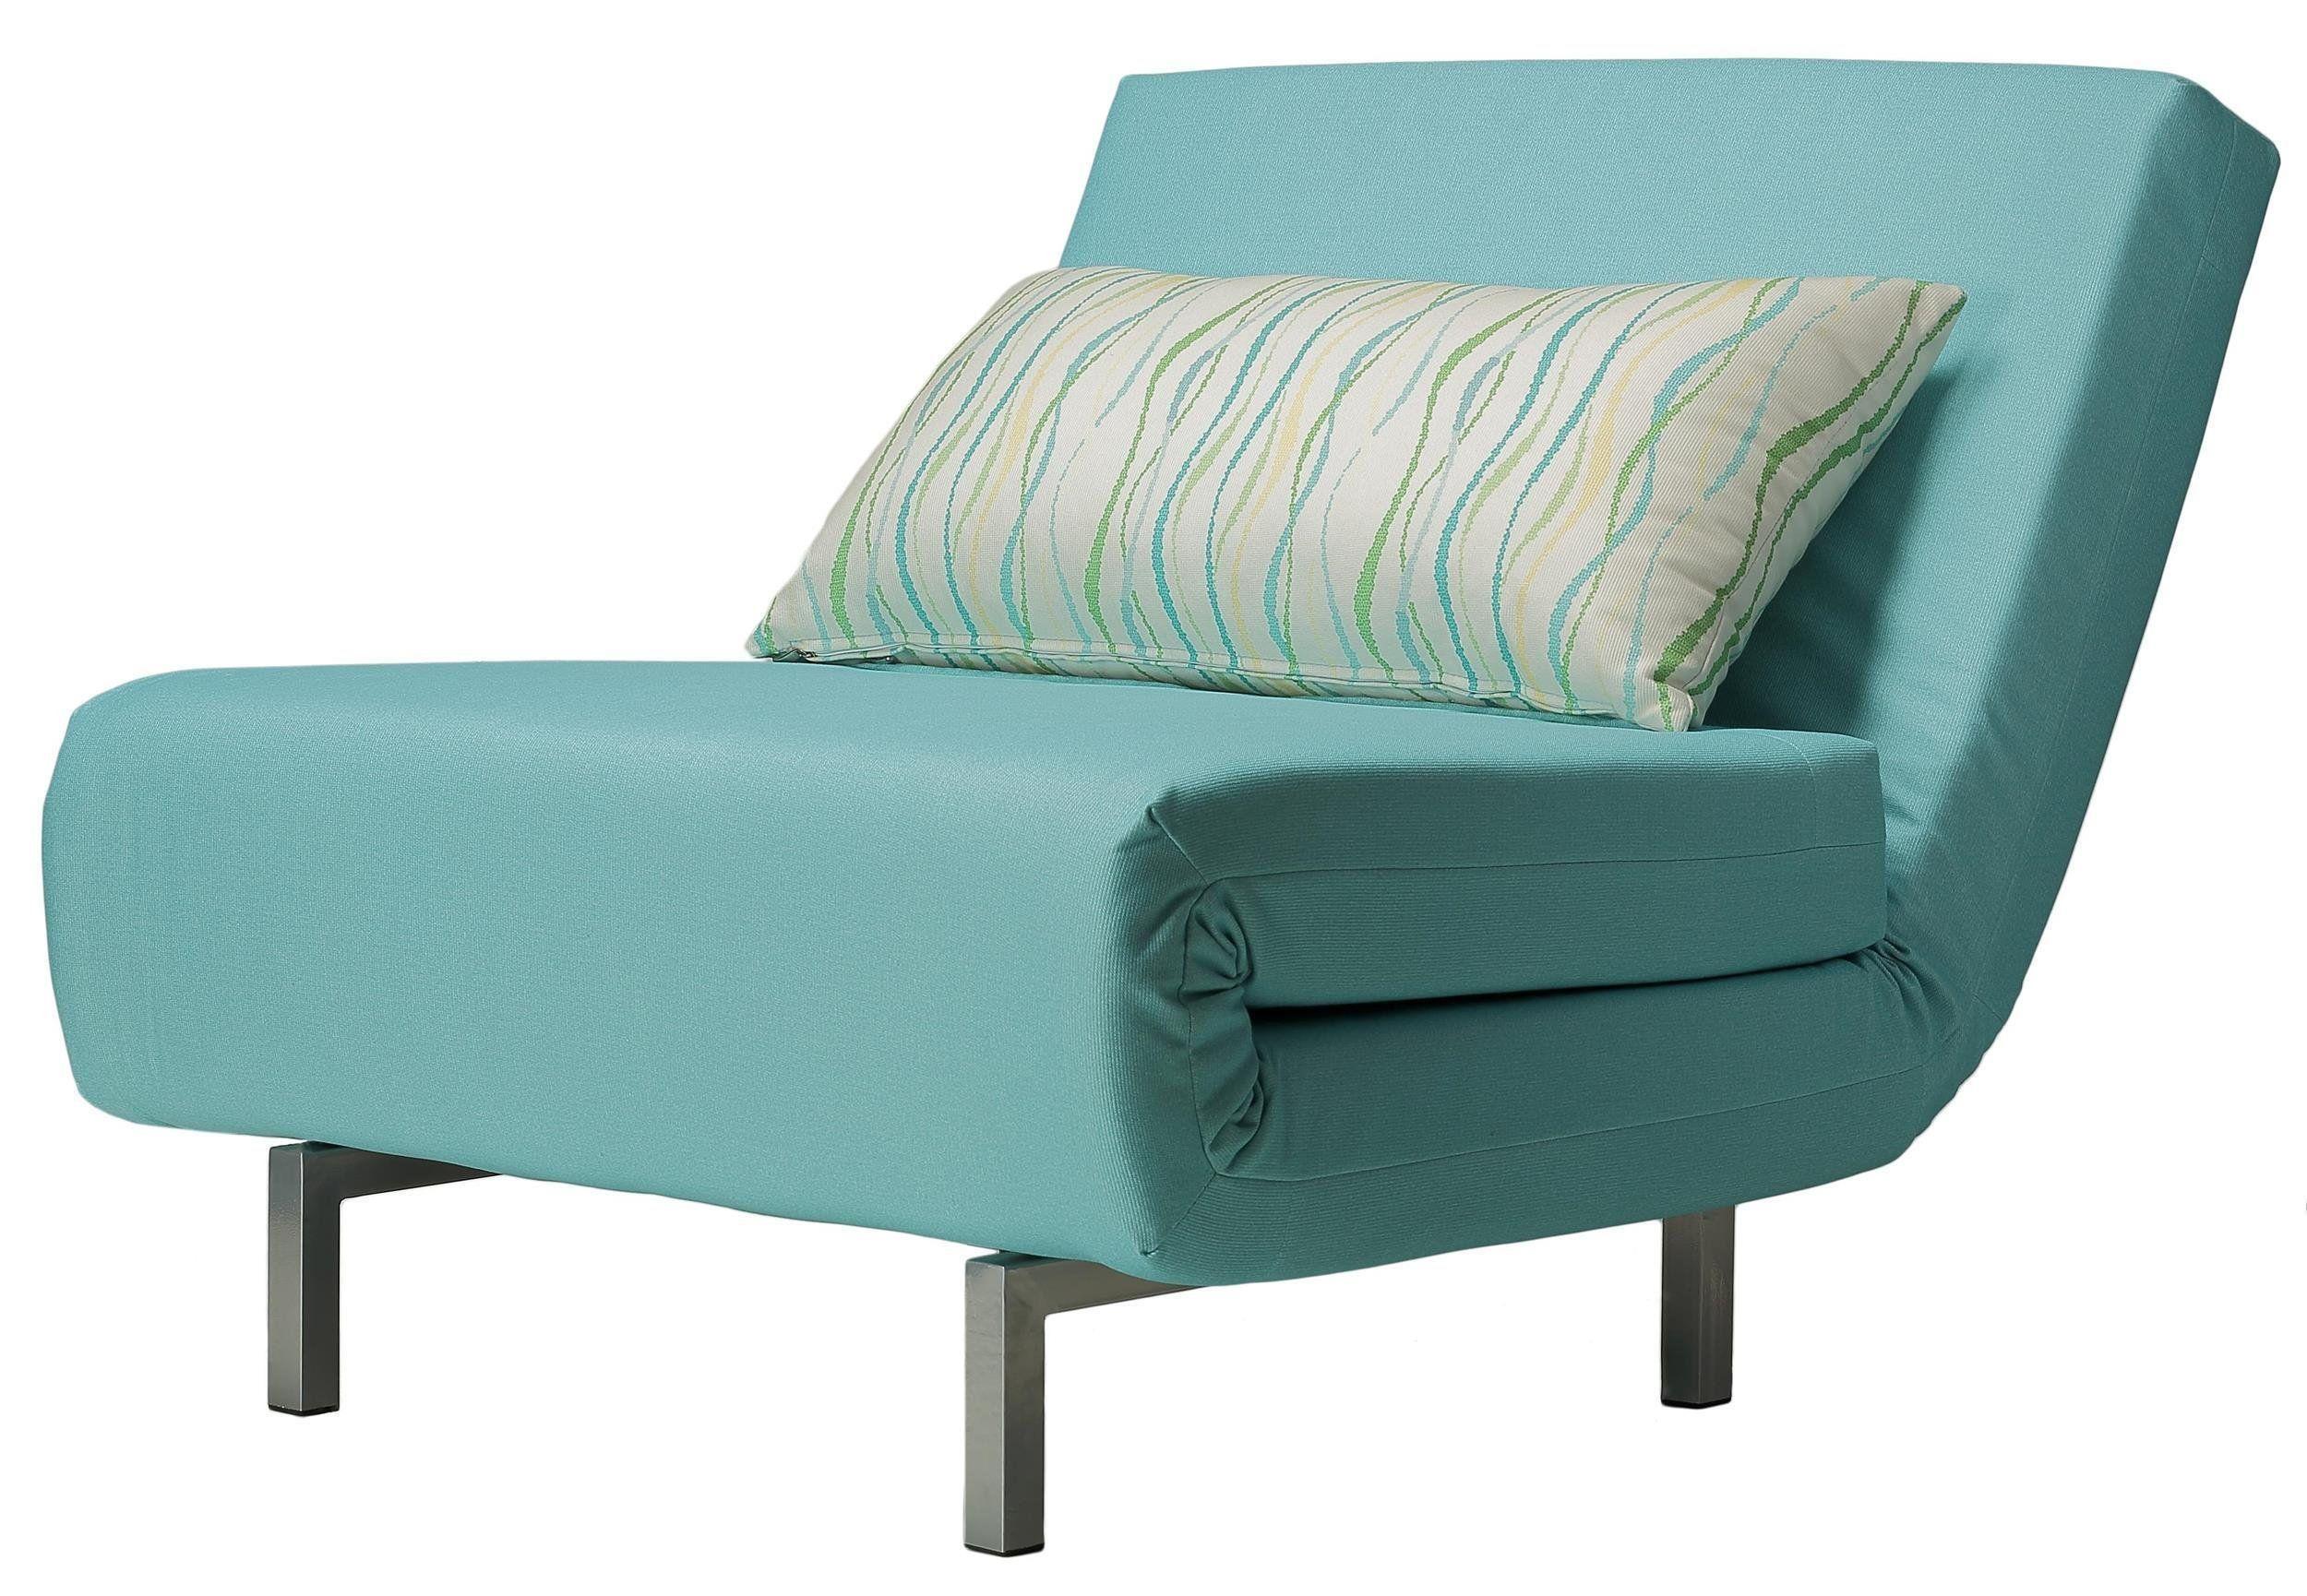 Wondrous Amazon Com Cortesi Home Savion Convertible Accent Chair Dailytribune Chair Design For Home Dailytribuneorg